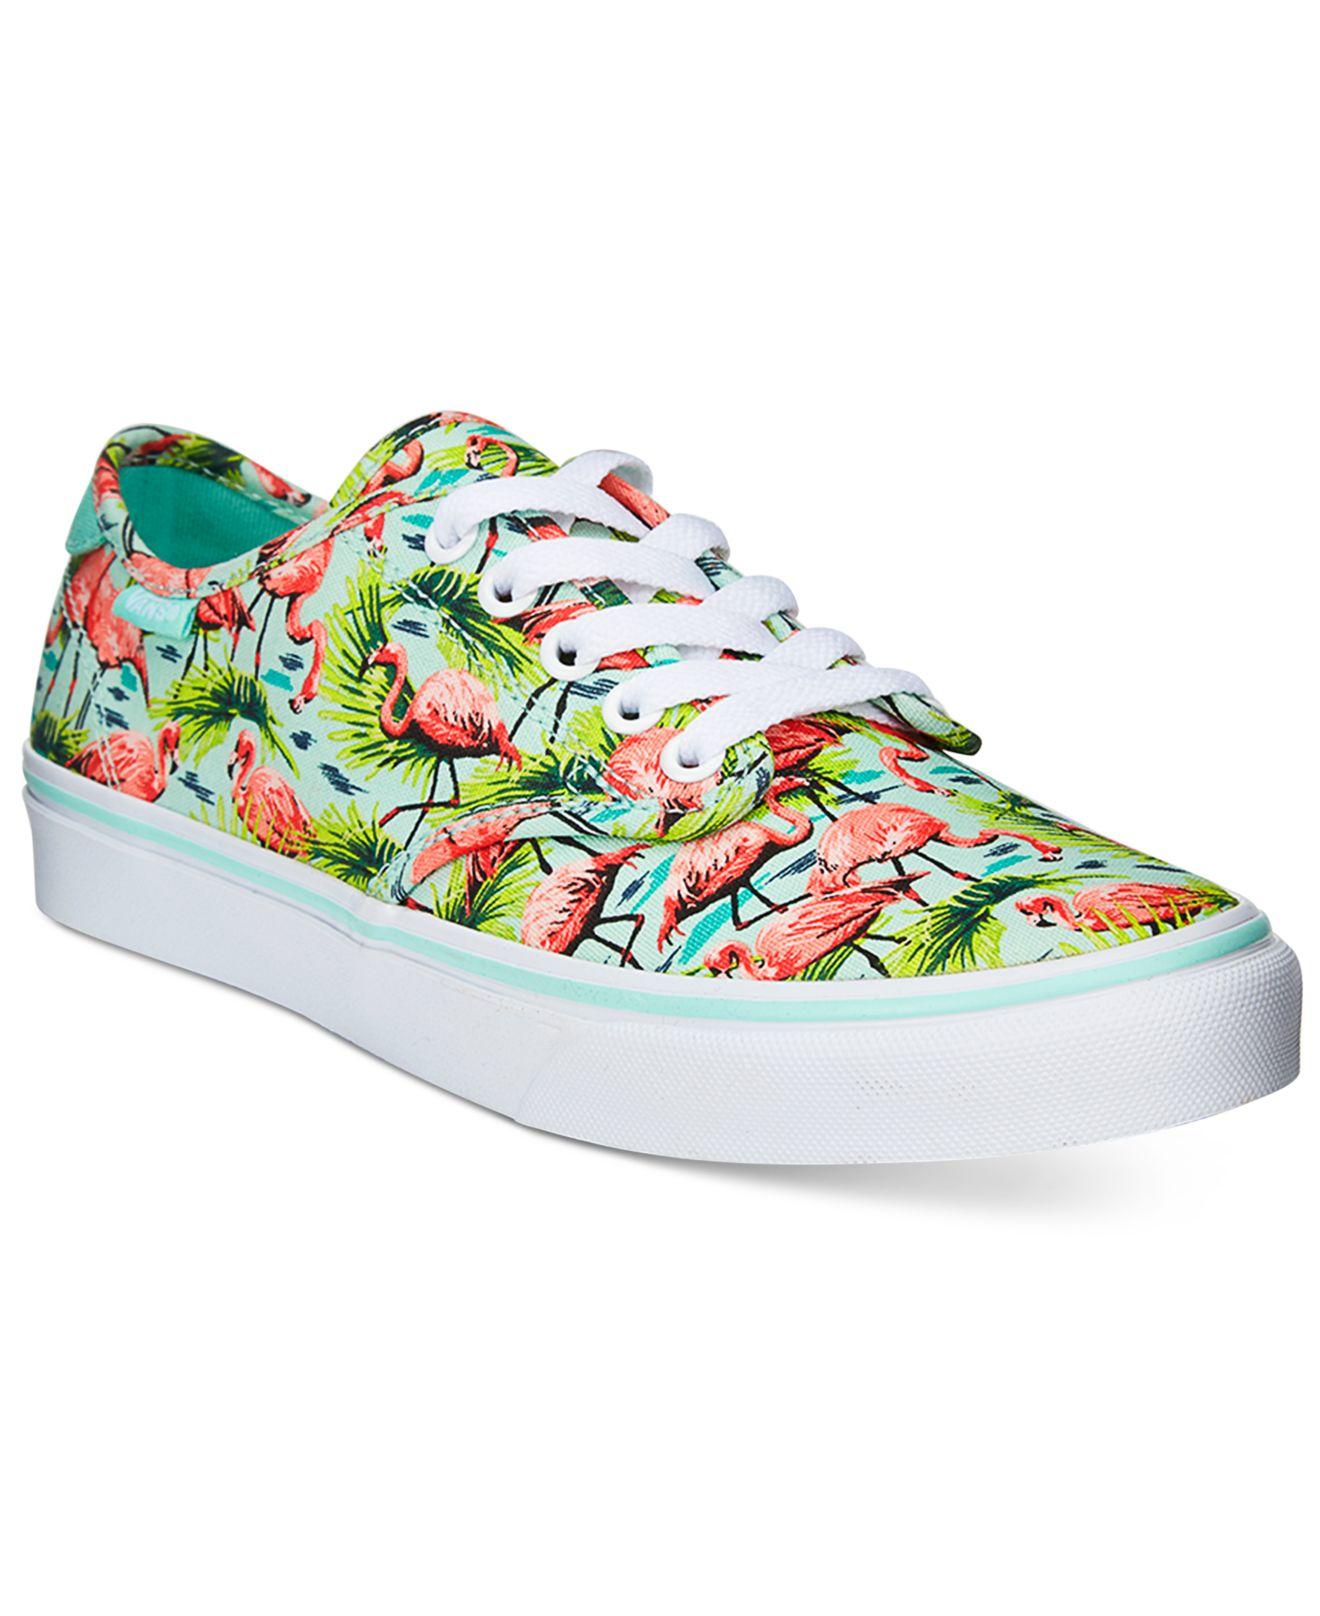 Womens Designer Skate Shoes